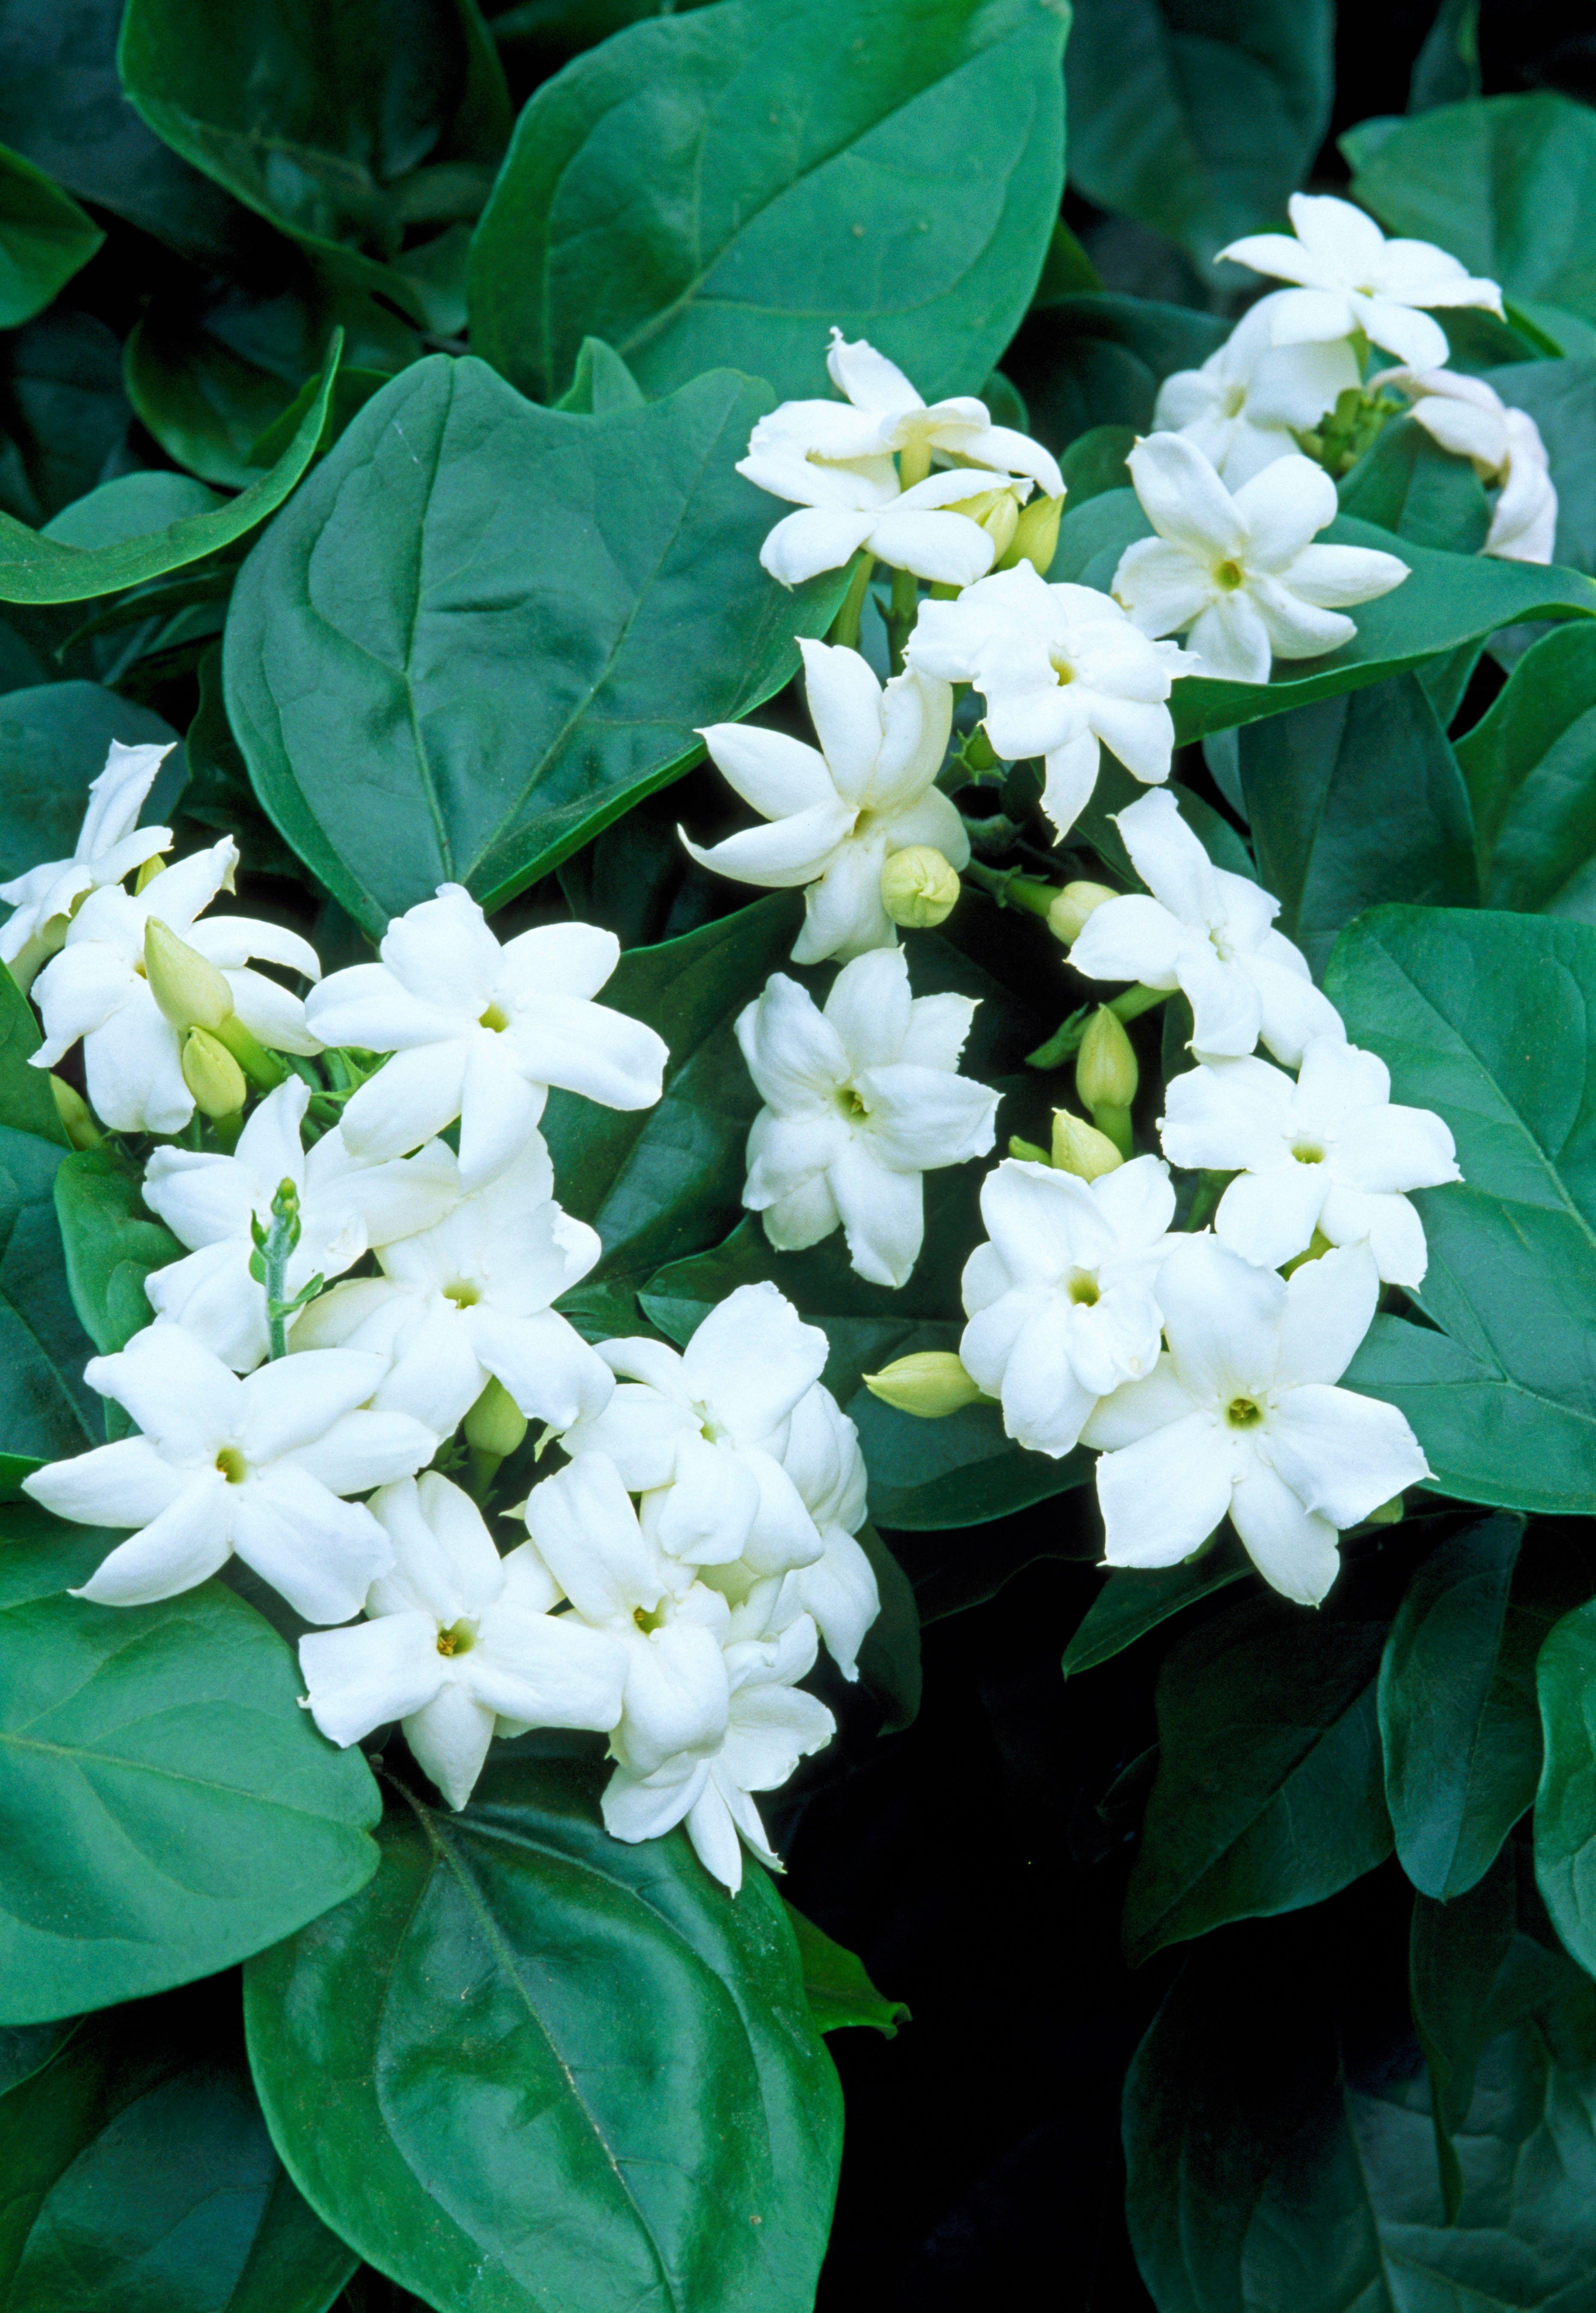 Arabian jasmine monrovia arabian jasmine juania creates arabian jasmine monrovia arabian jasmine izmirmasajfo